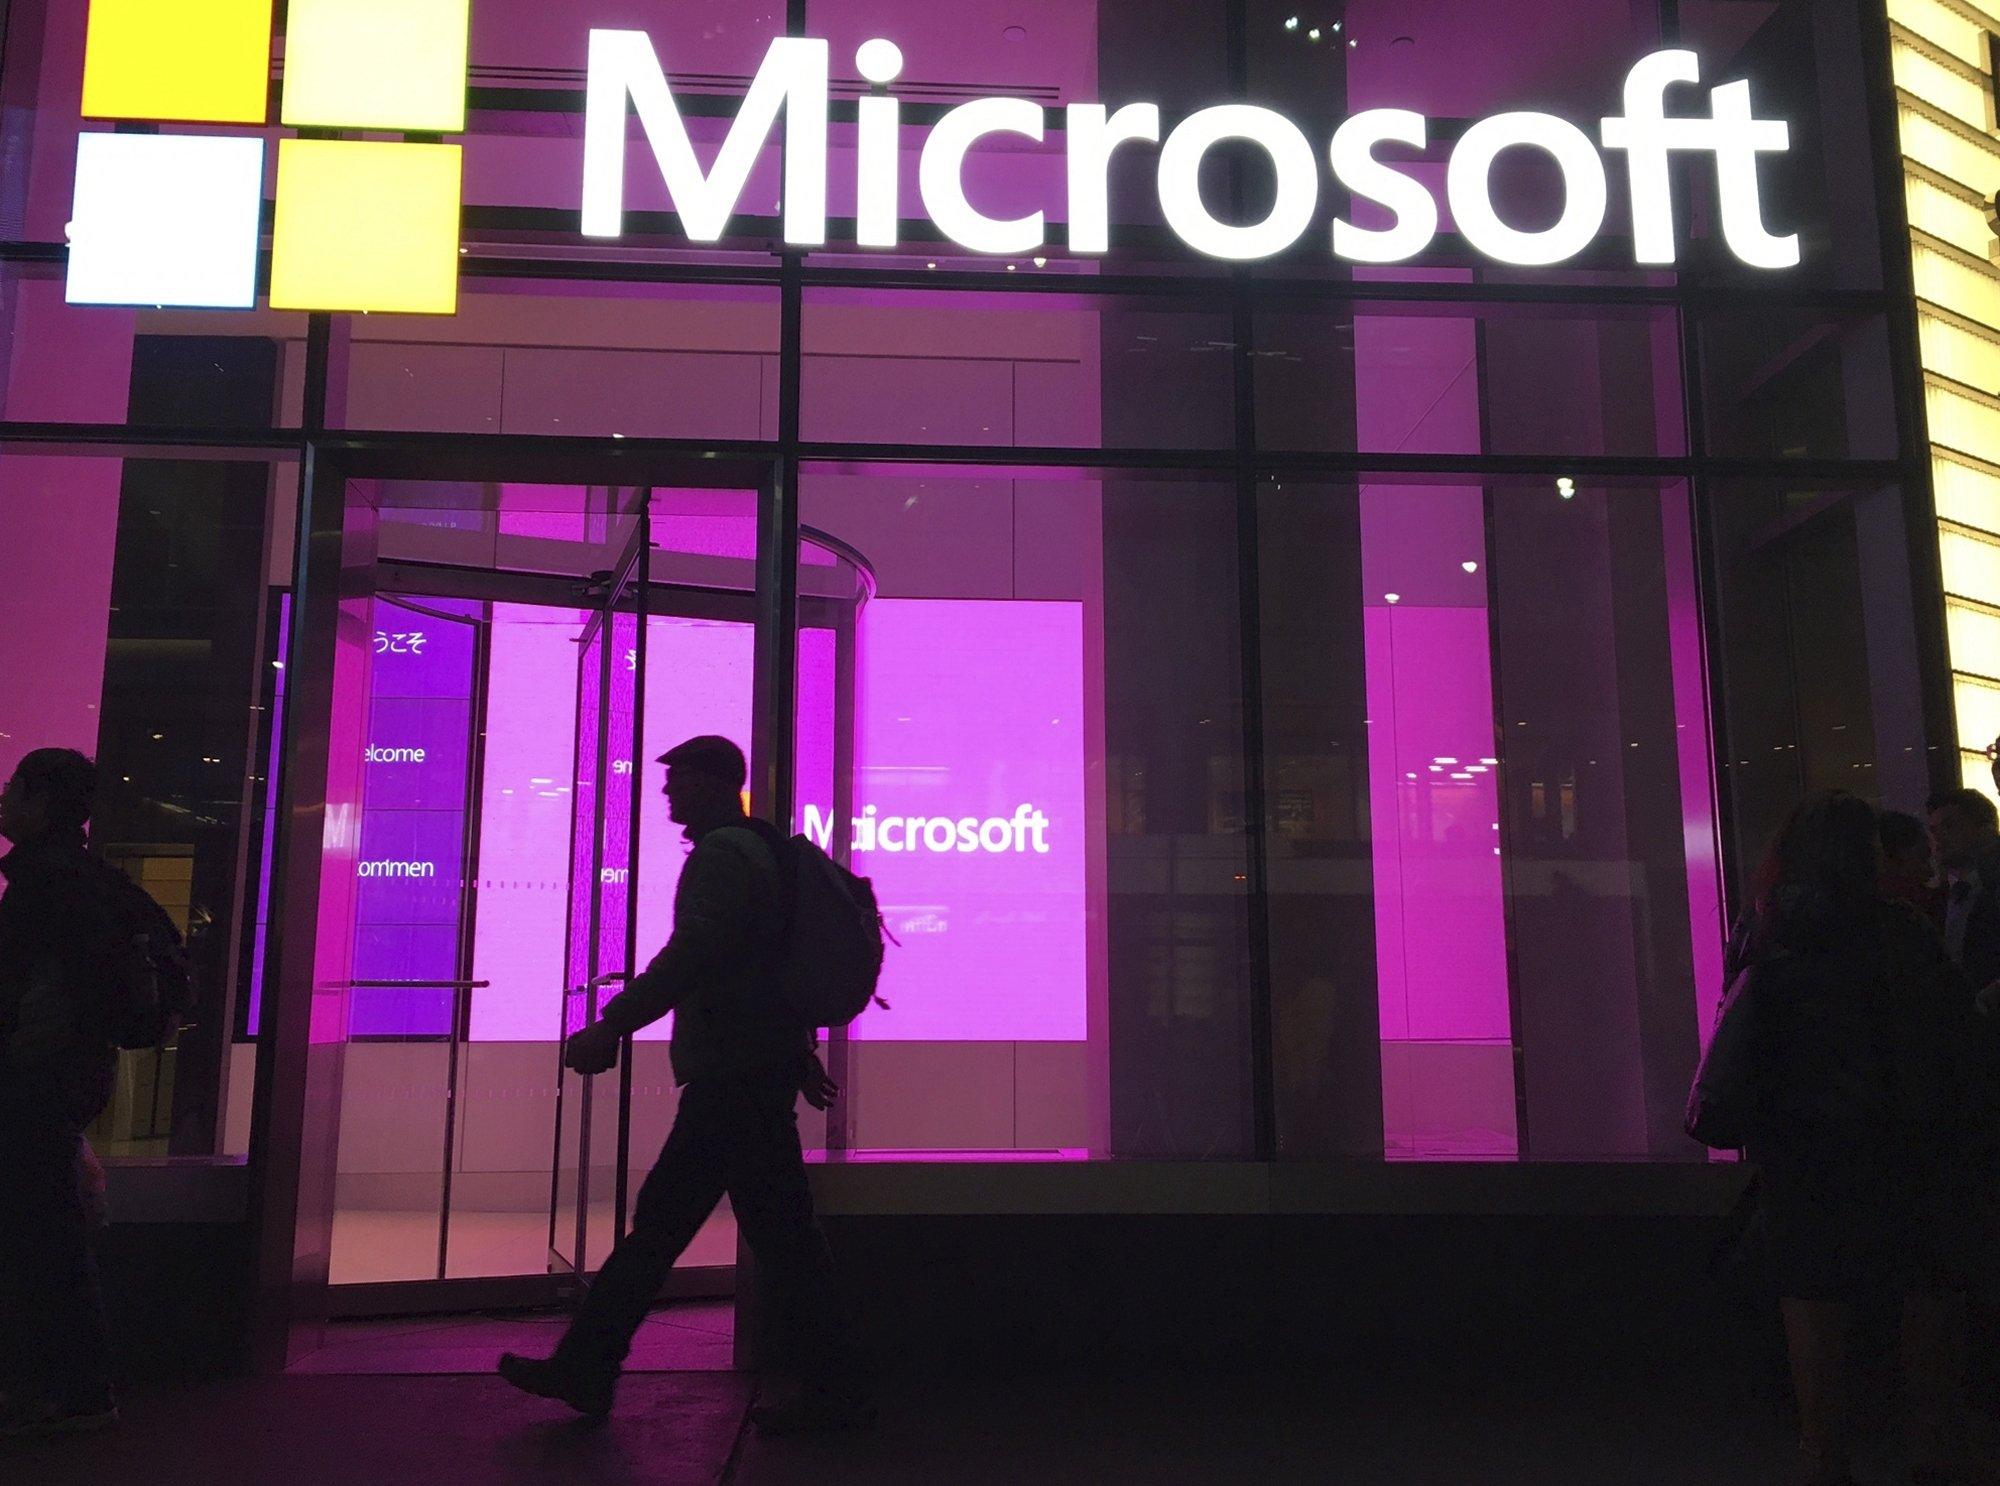 People walk past a Microsoft office in New York, U.S., Nov. 10, 2016. (AP Photo)